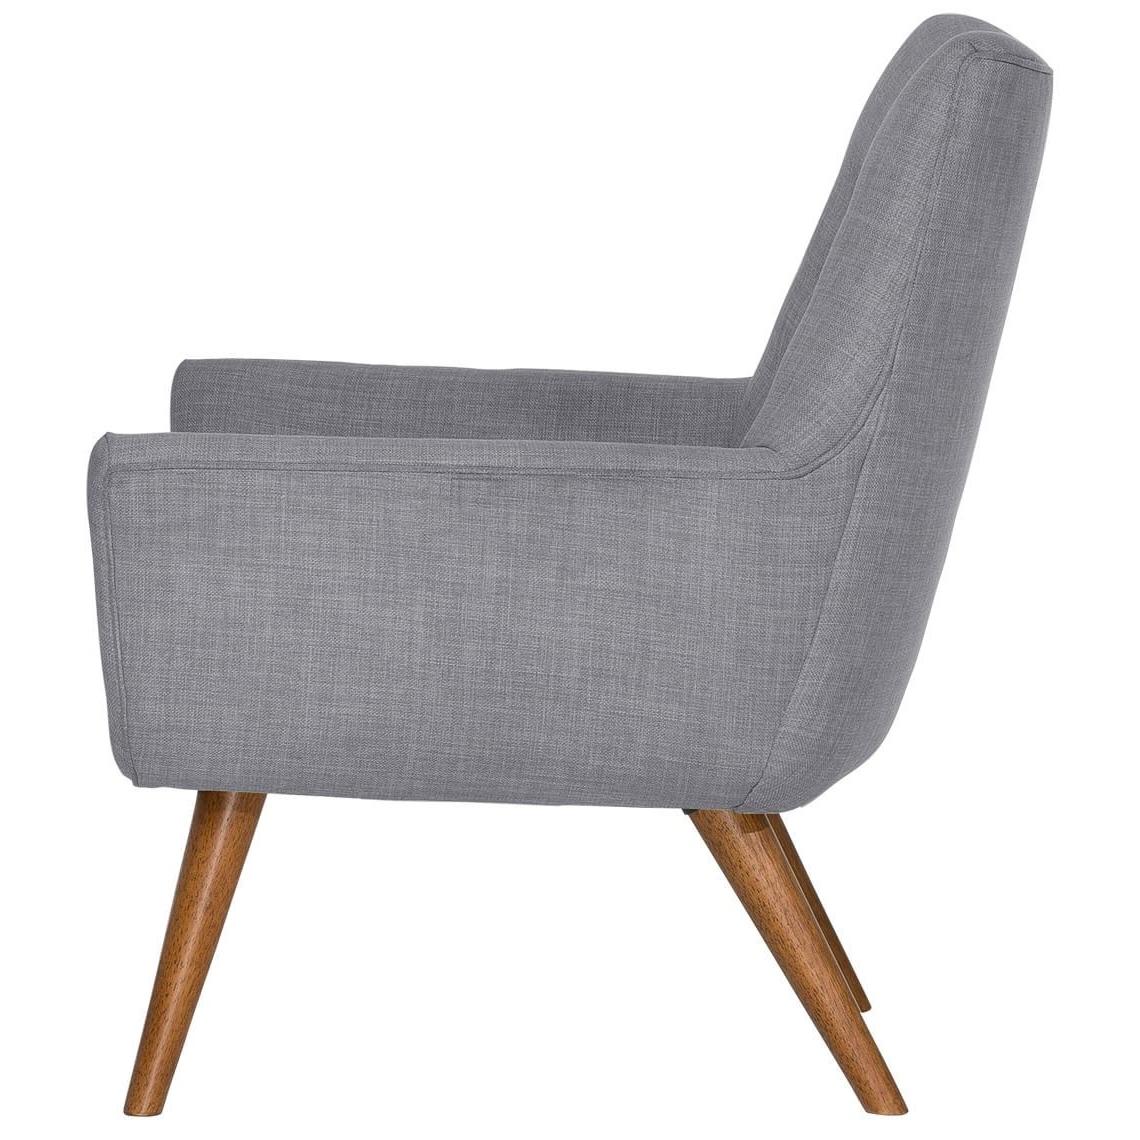 Moda Grey Side Chairs Regarding Current Hazelnut Leg) Light Grey Retro Chair (View 19 of 20)